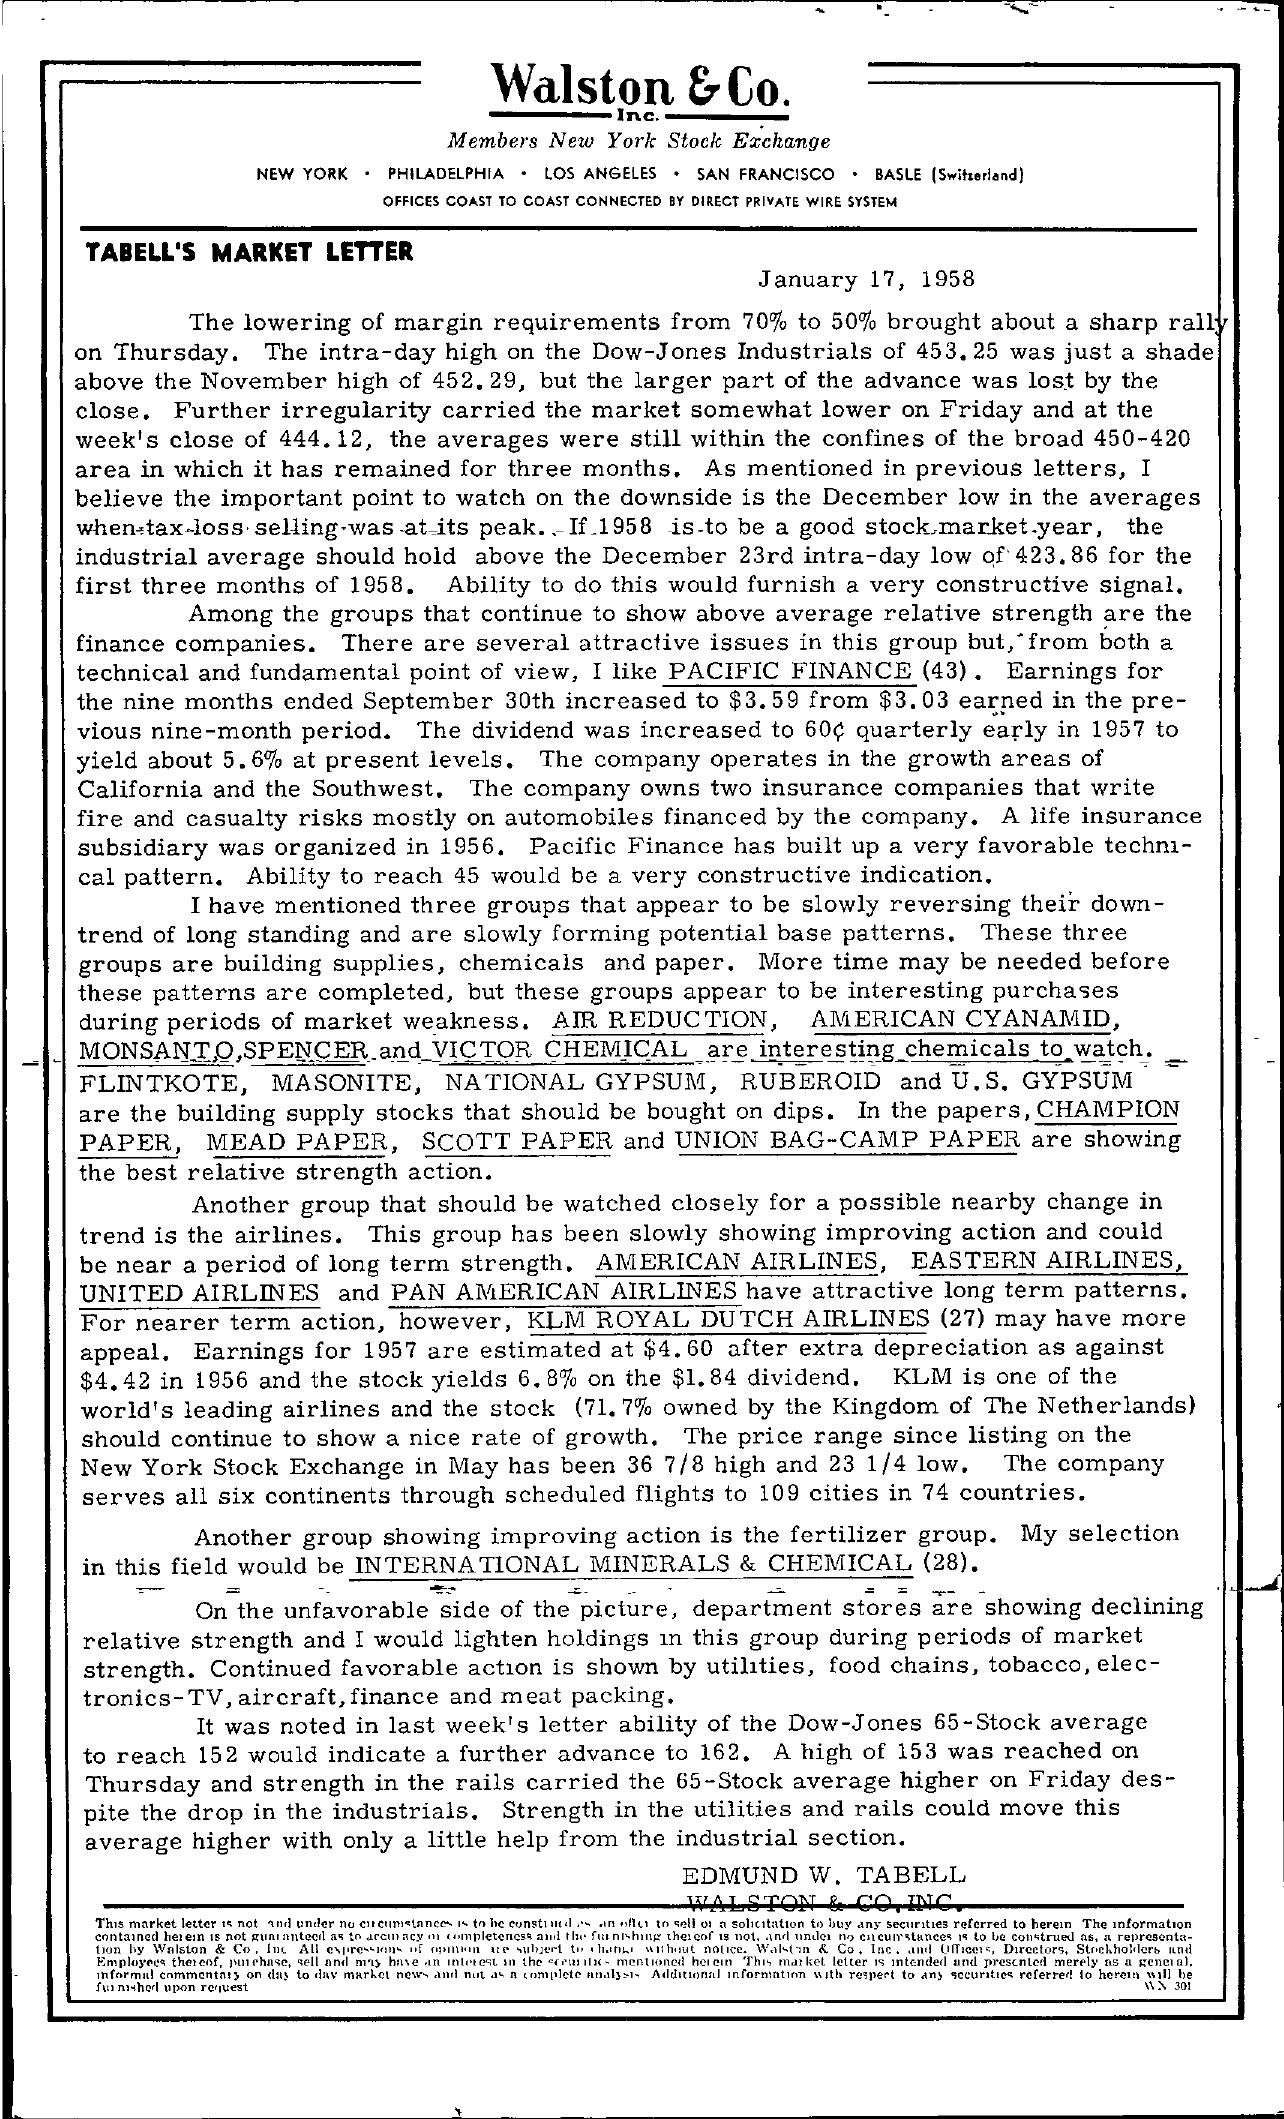 Tabell's Market Letter - January 17, 1958